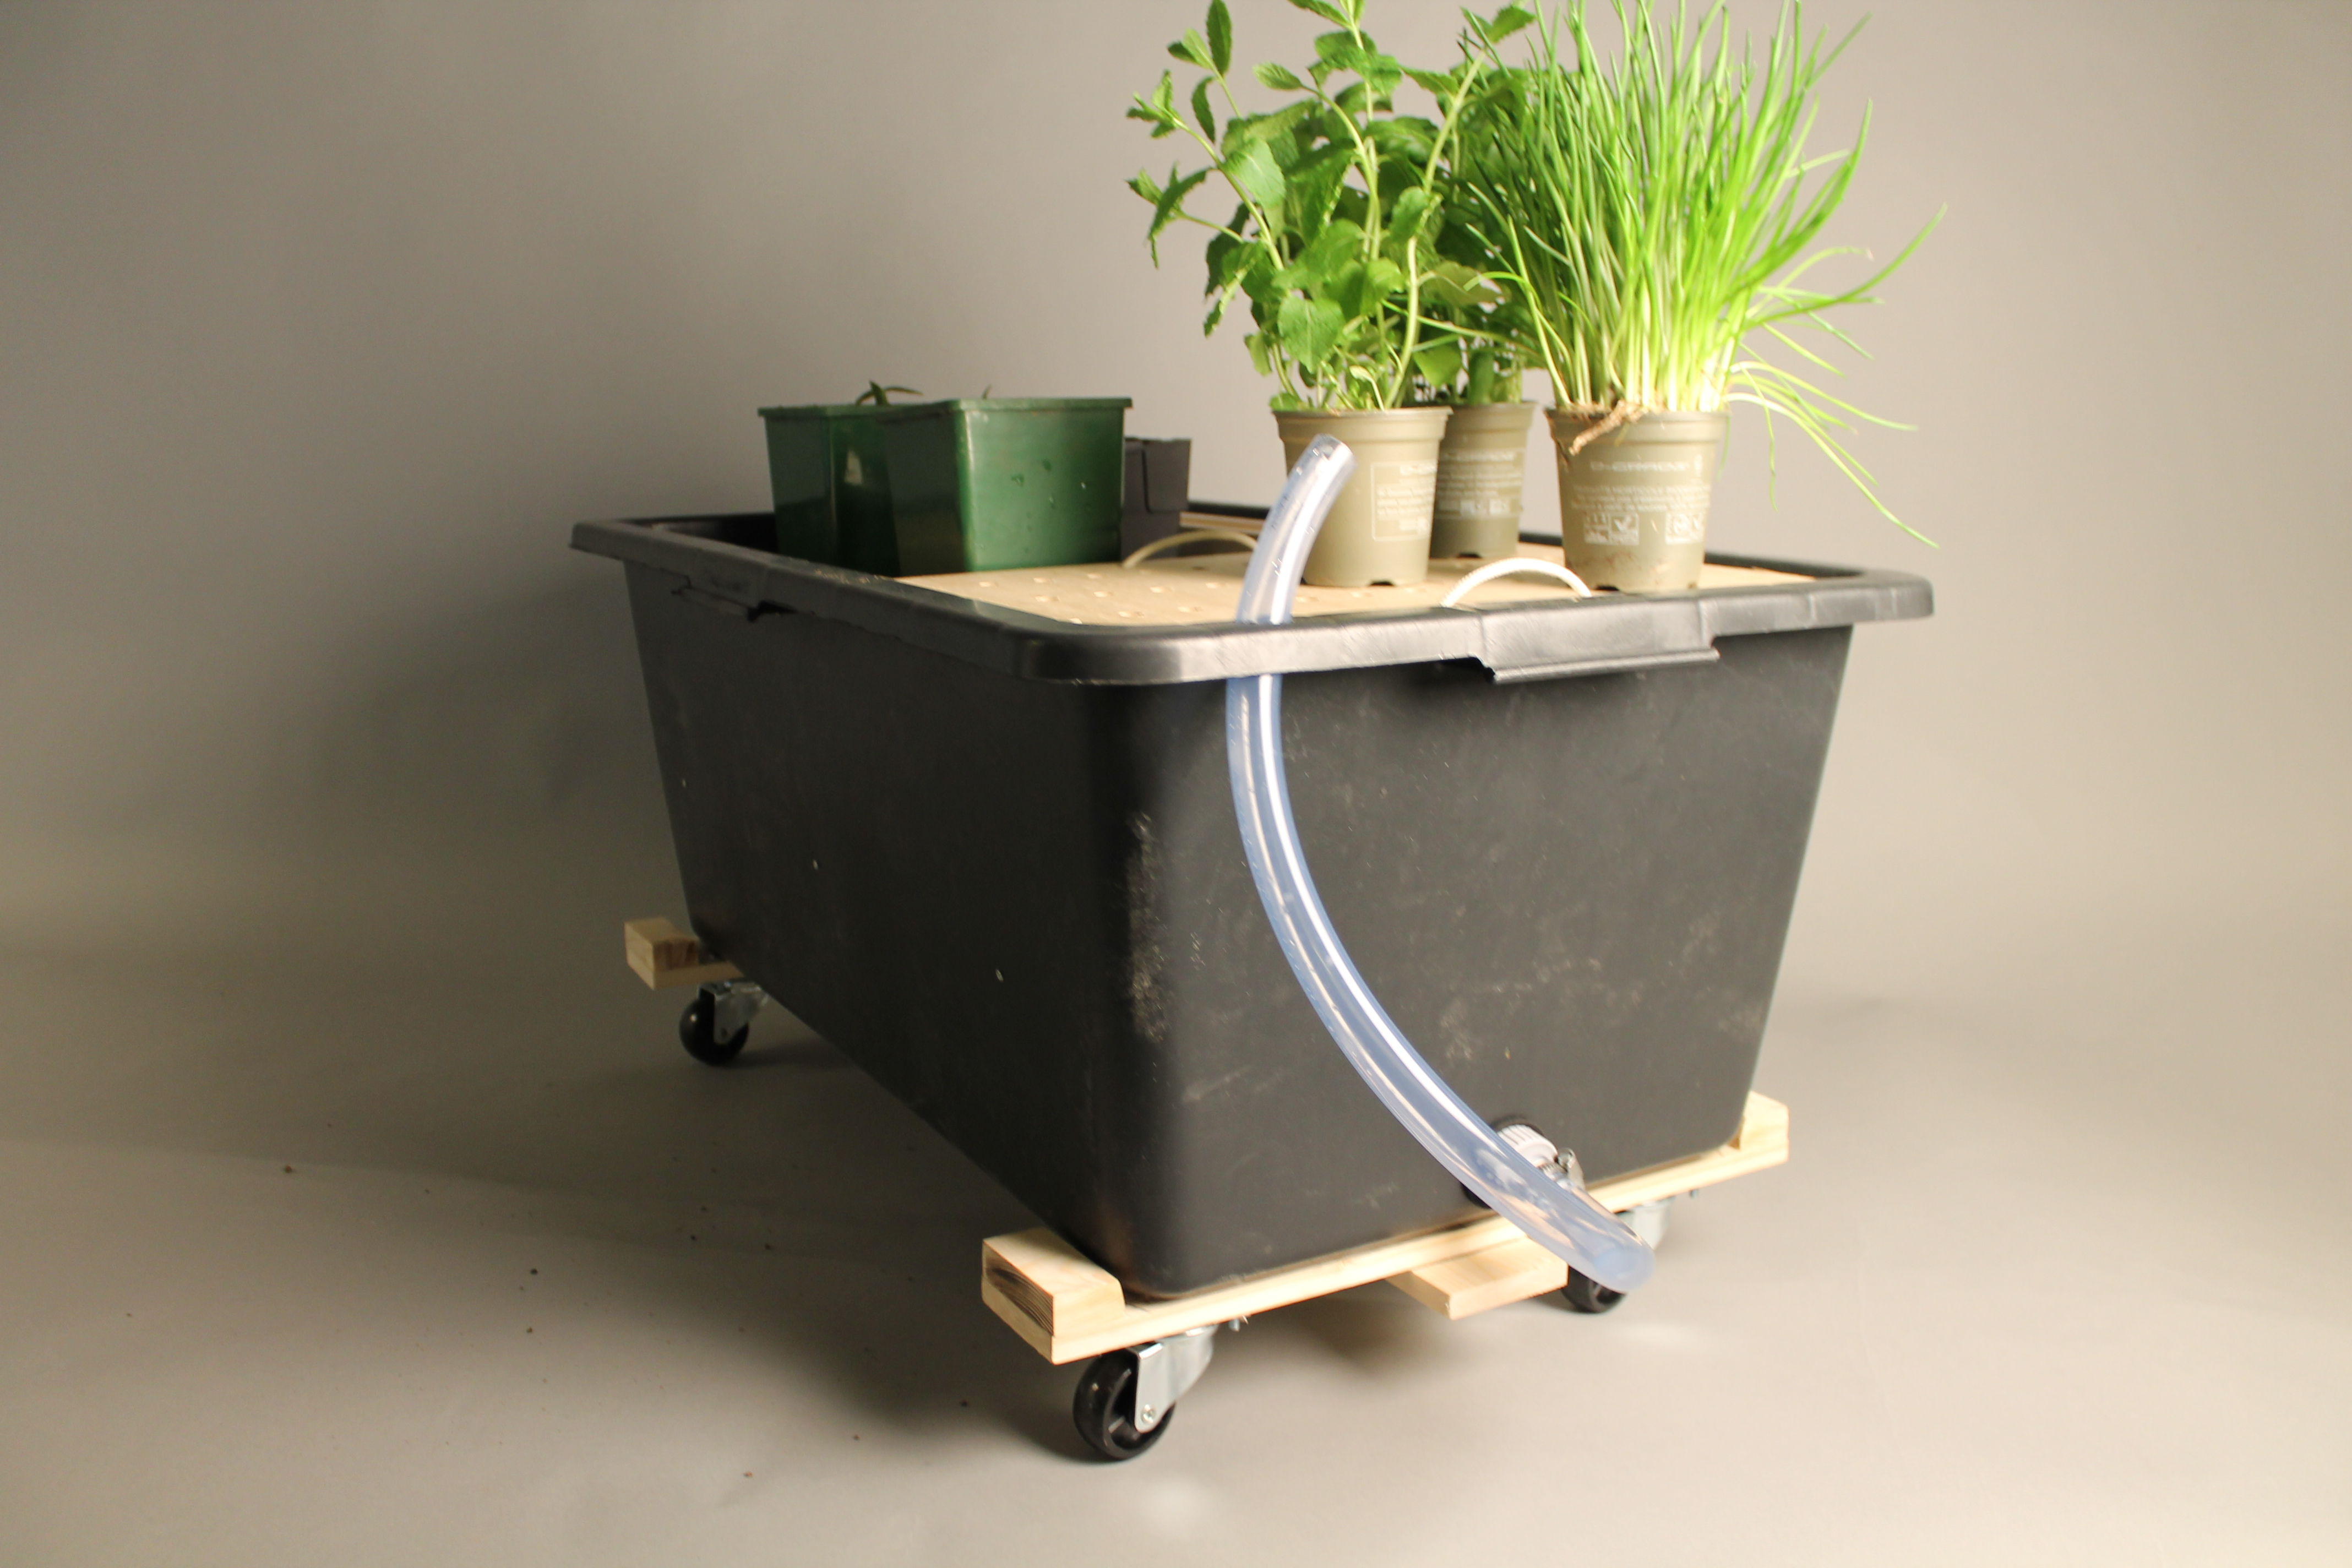 Self watering bin